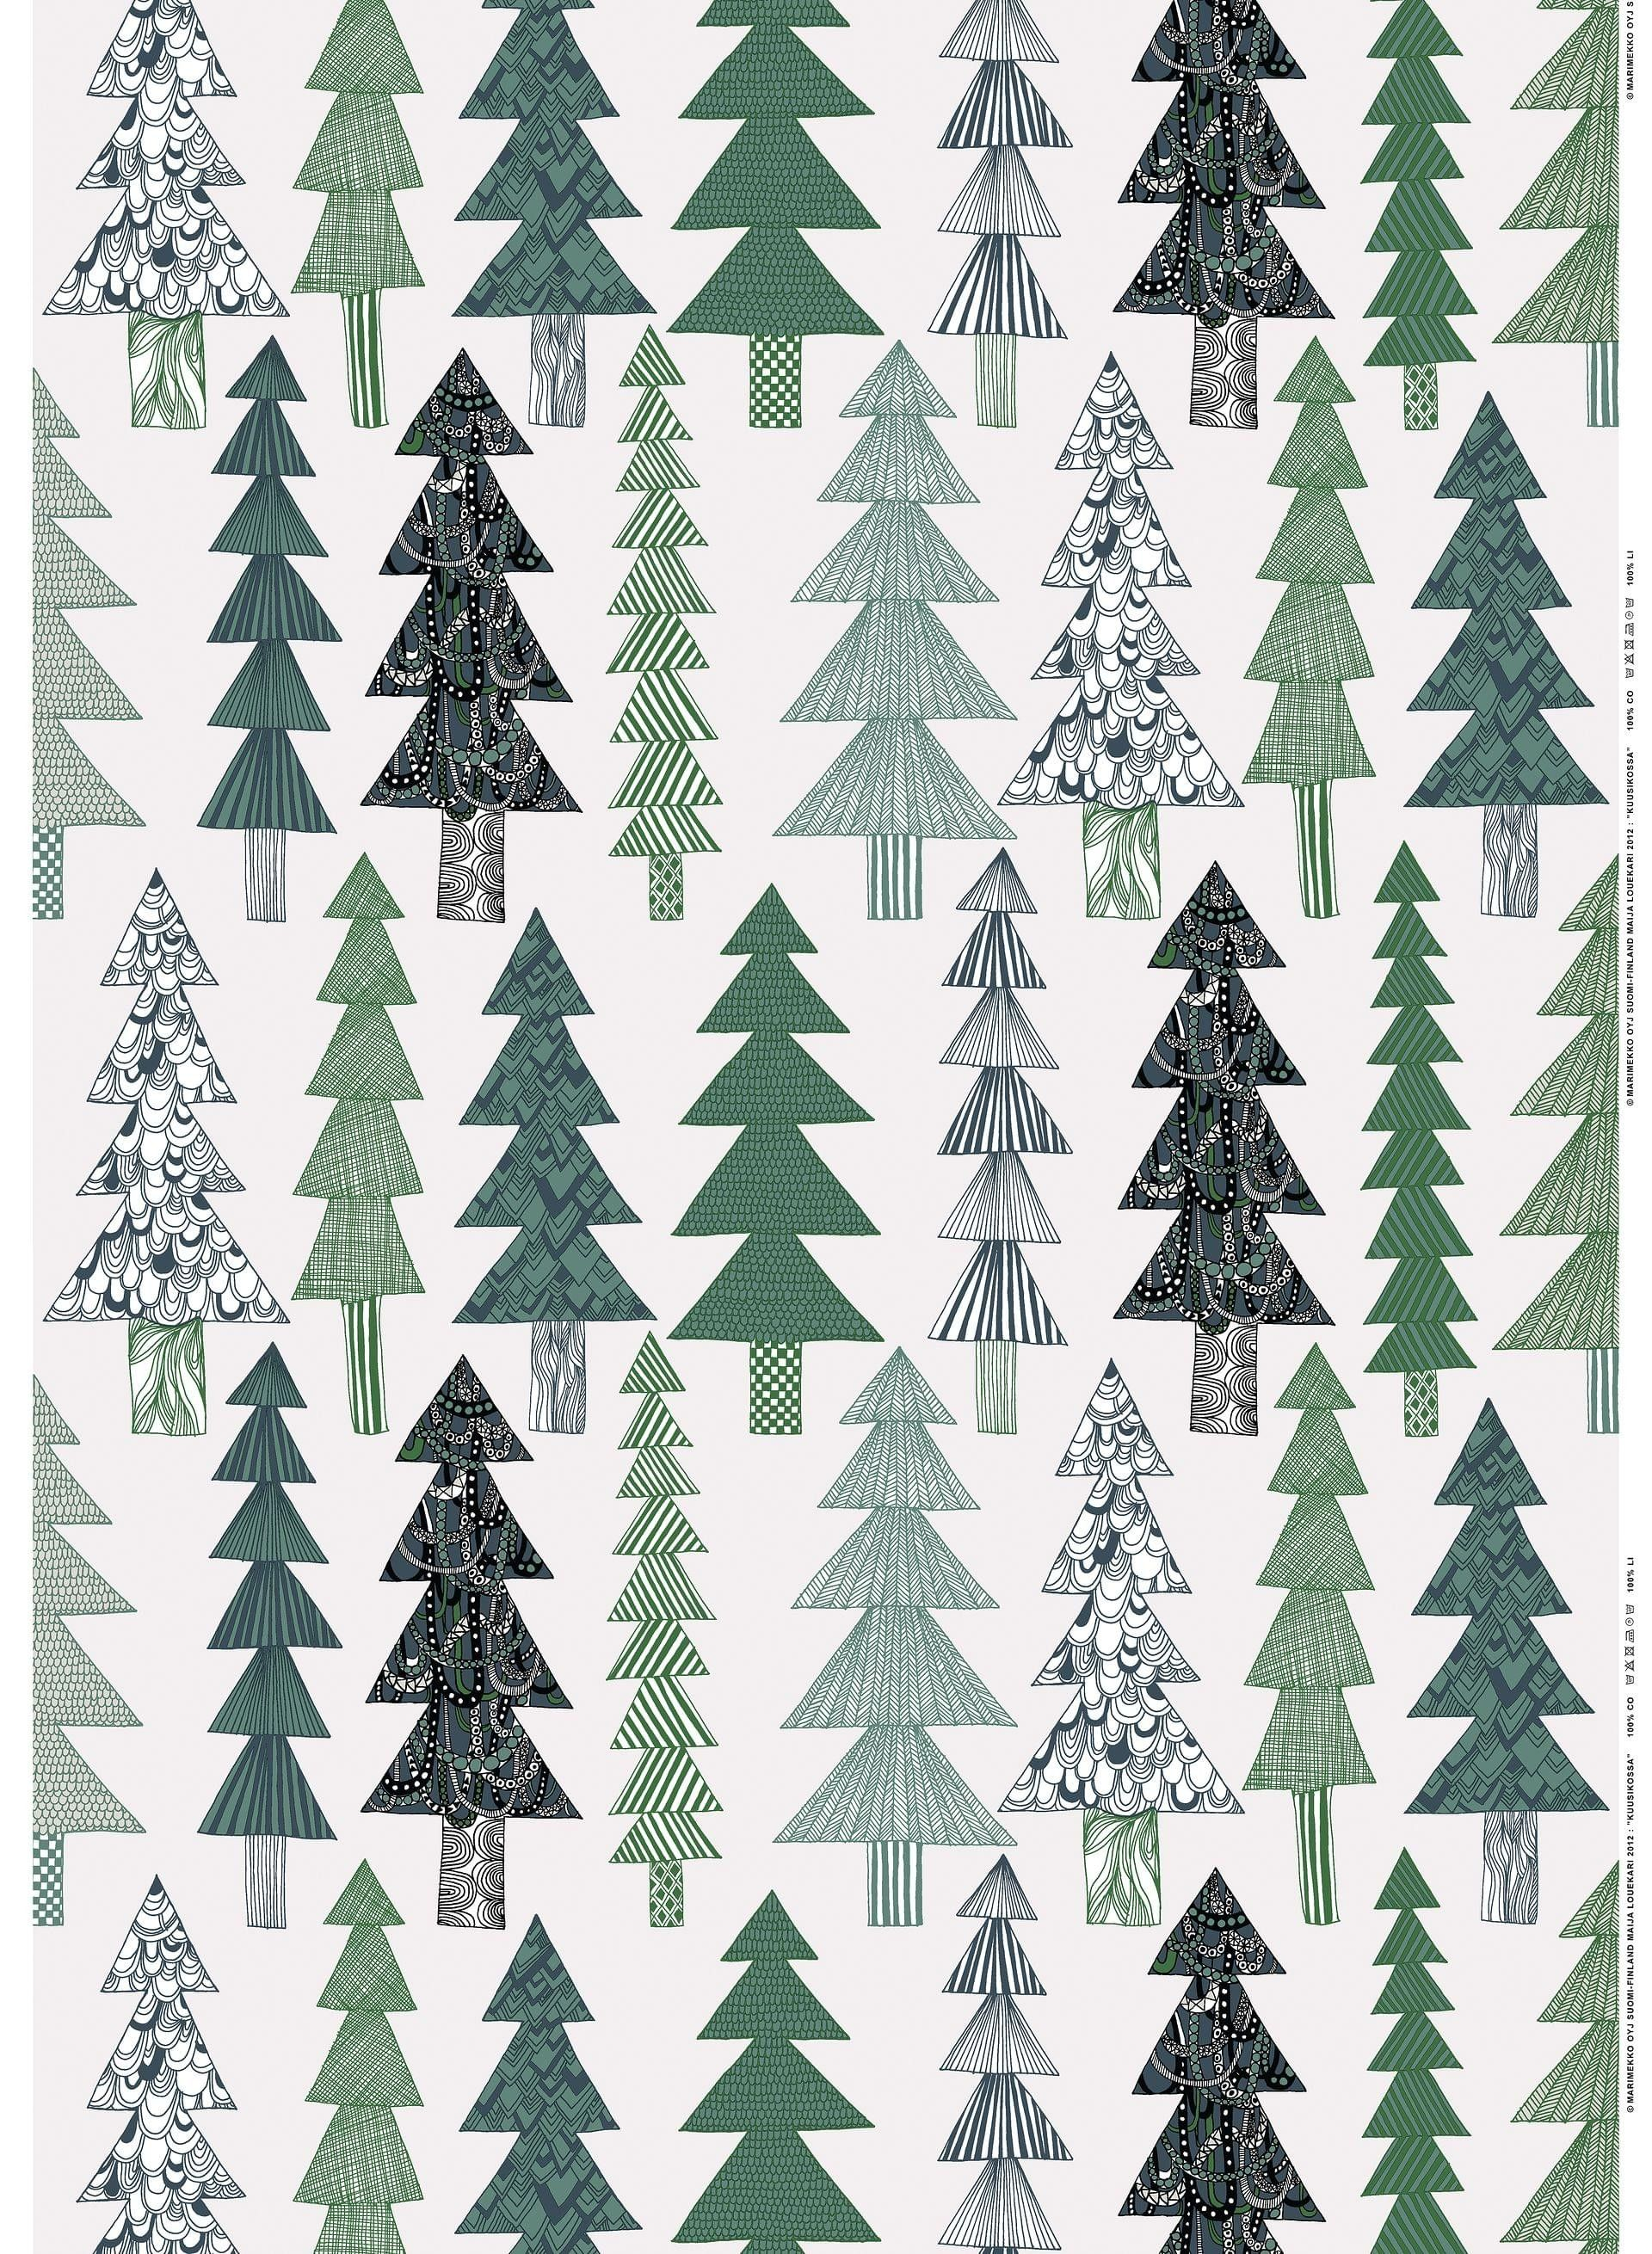 This Is How I Would Do Marimekko Distinct But Quiet Marimekko Fabric Christmas Phone Backgrounds Marimekko Pattern